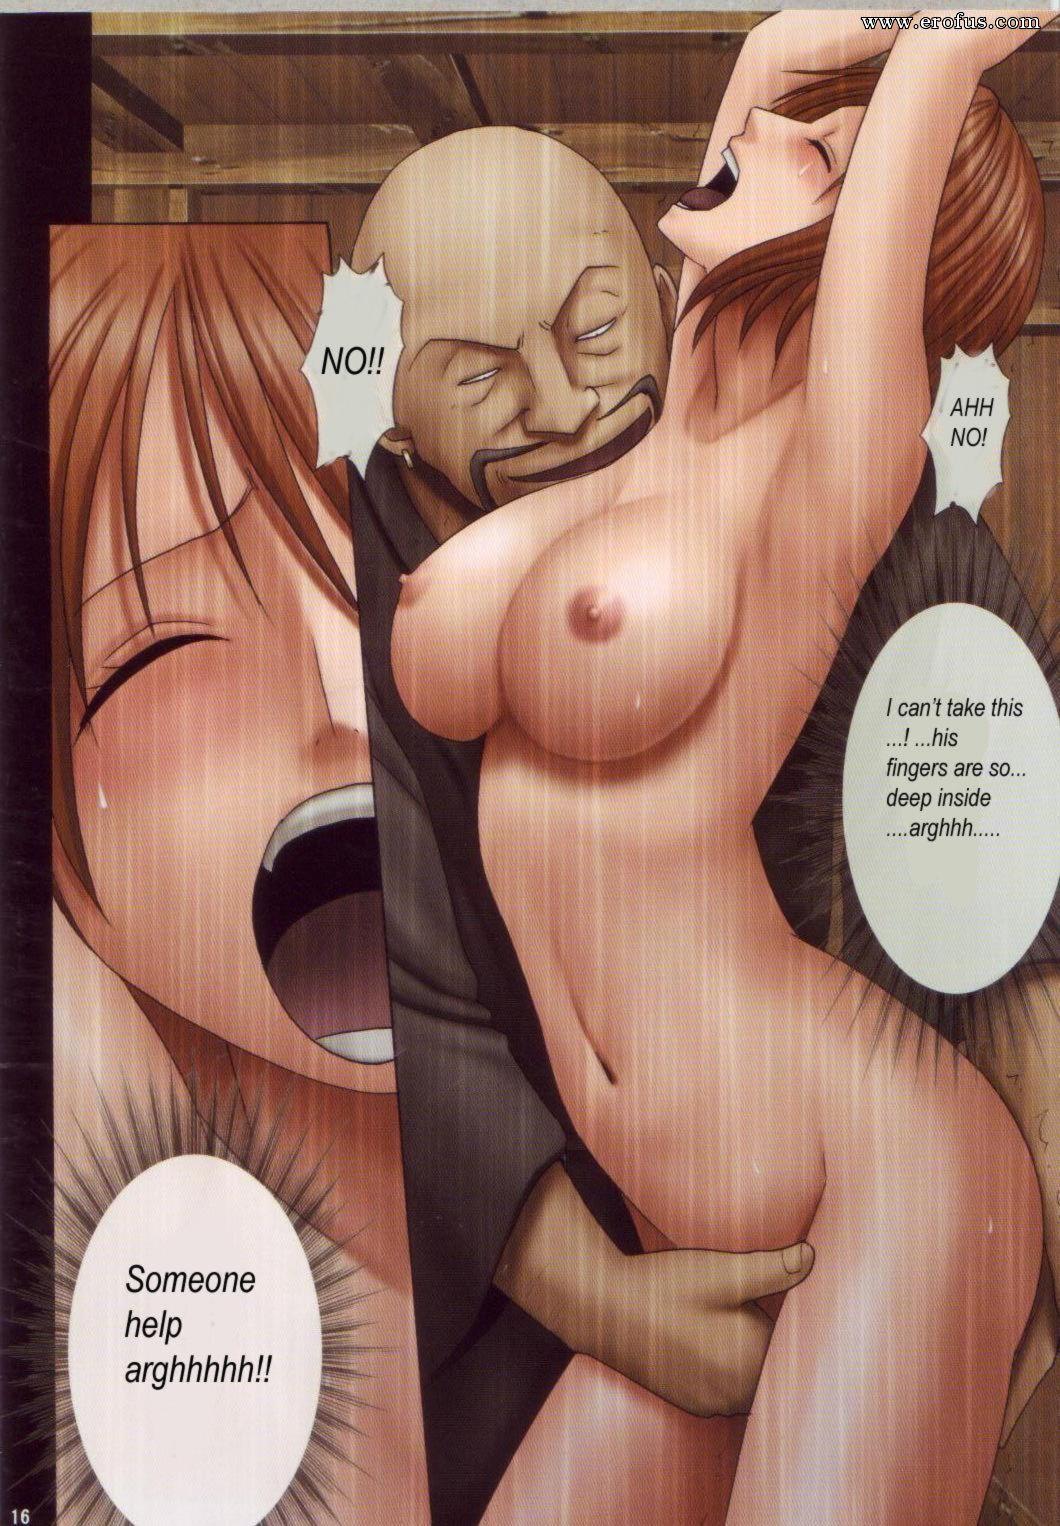 Nami Hentai Porno page 14 | hentai-and-manga-english/crimson-hentai/one-piece